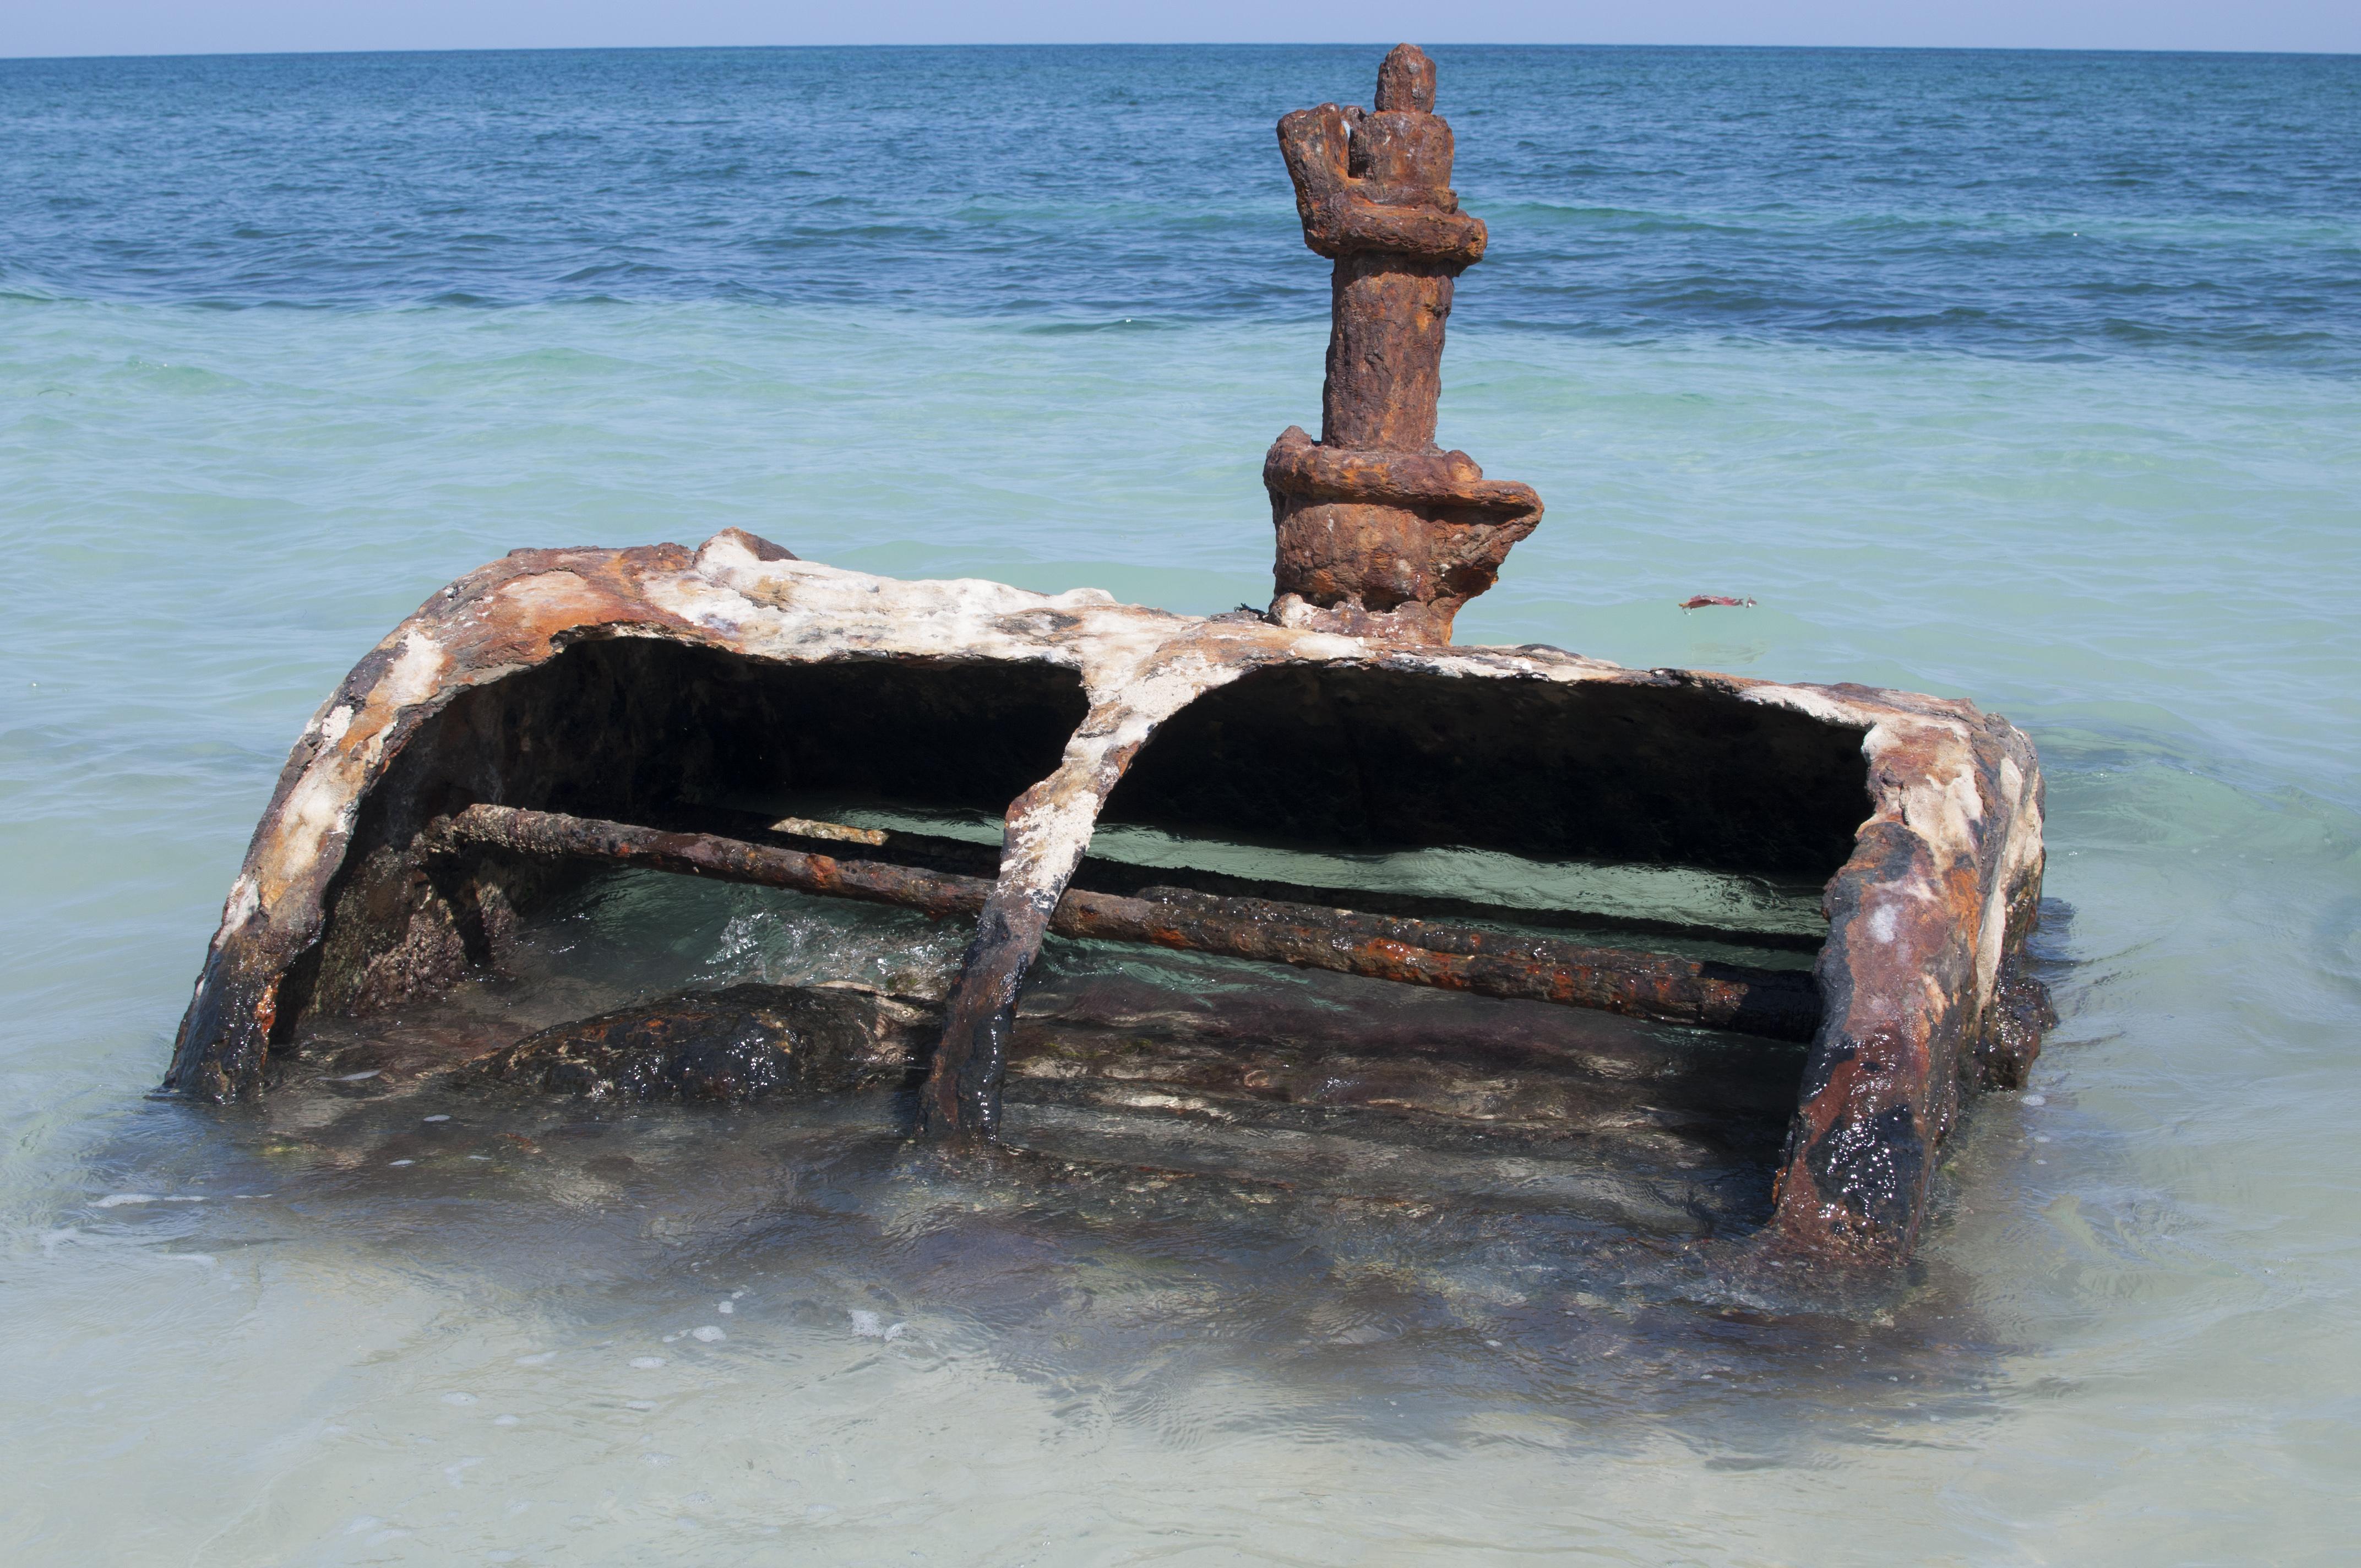 FileHopewell Hanover Jamaica Steamship Wreck Photo D